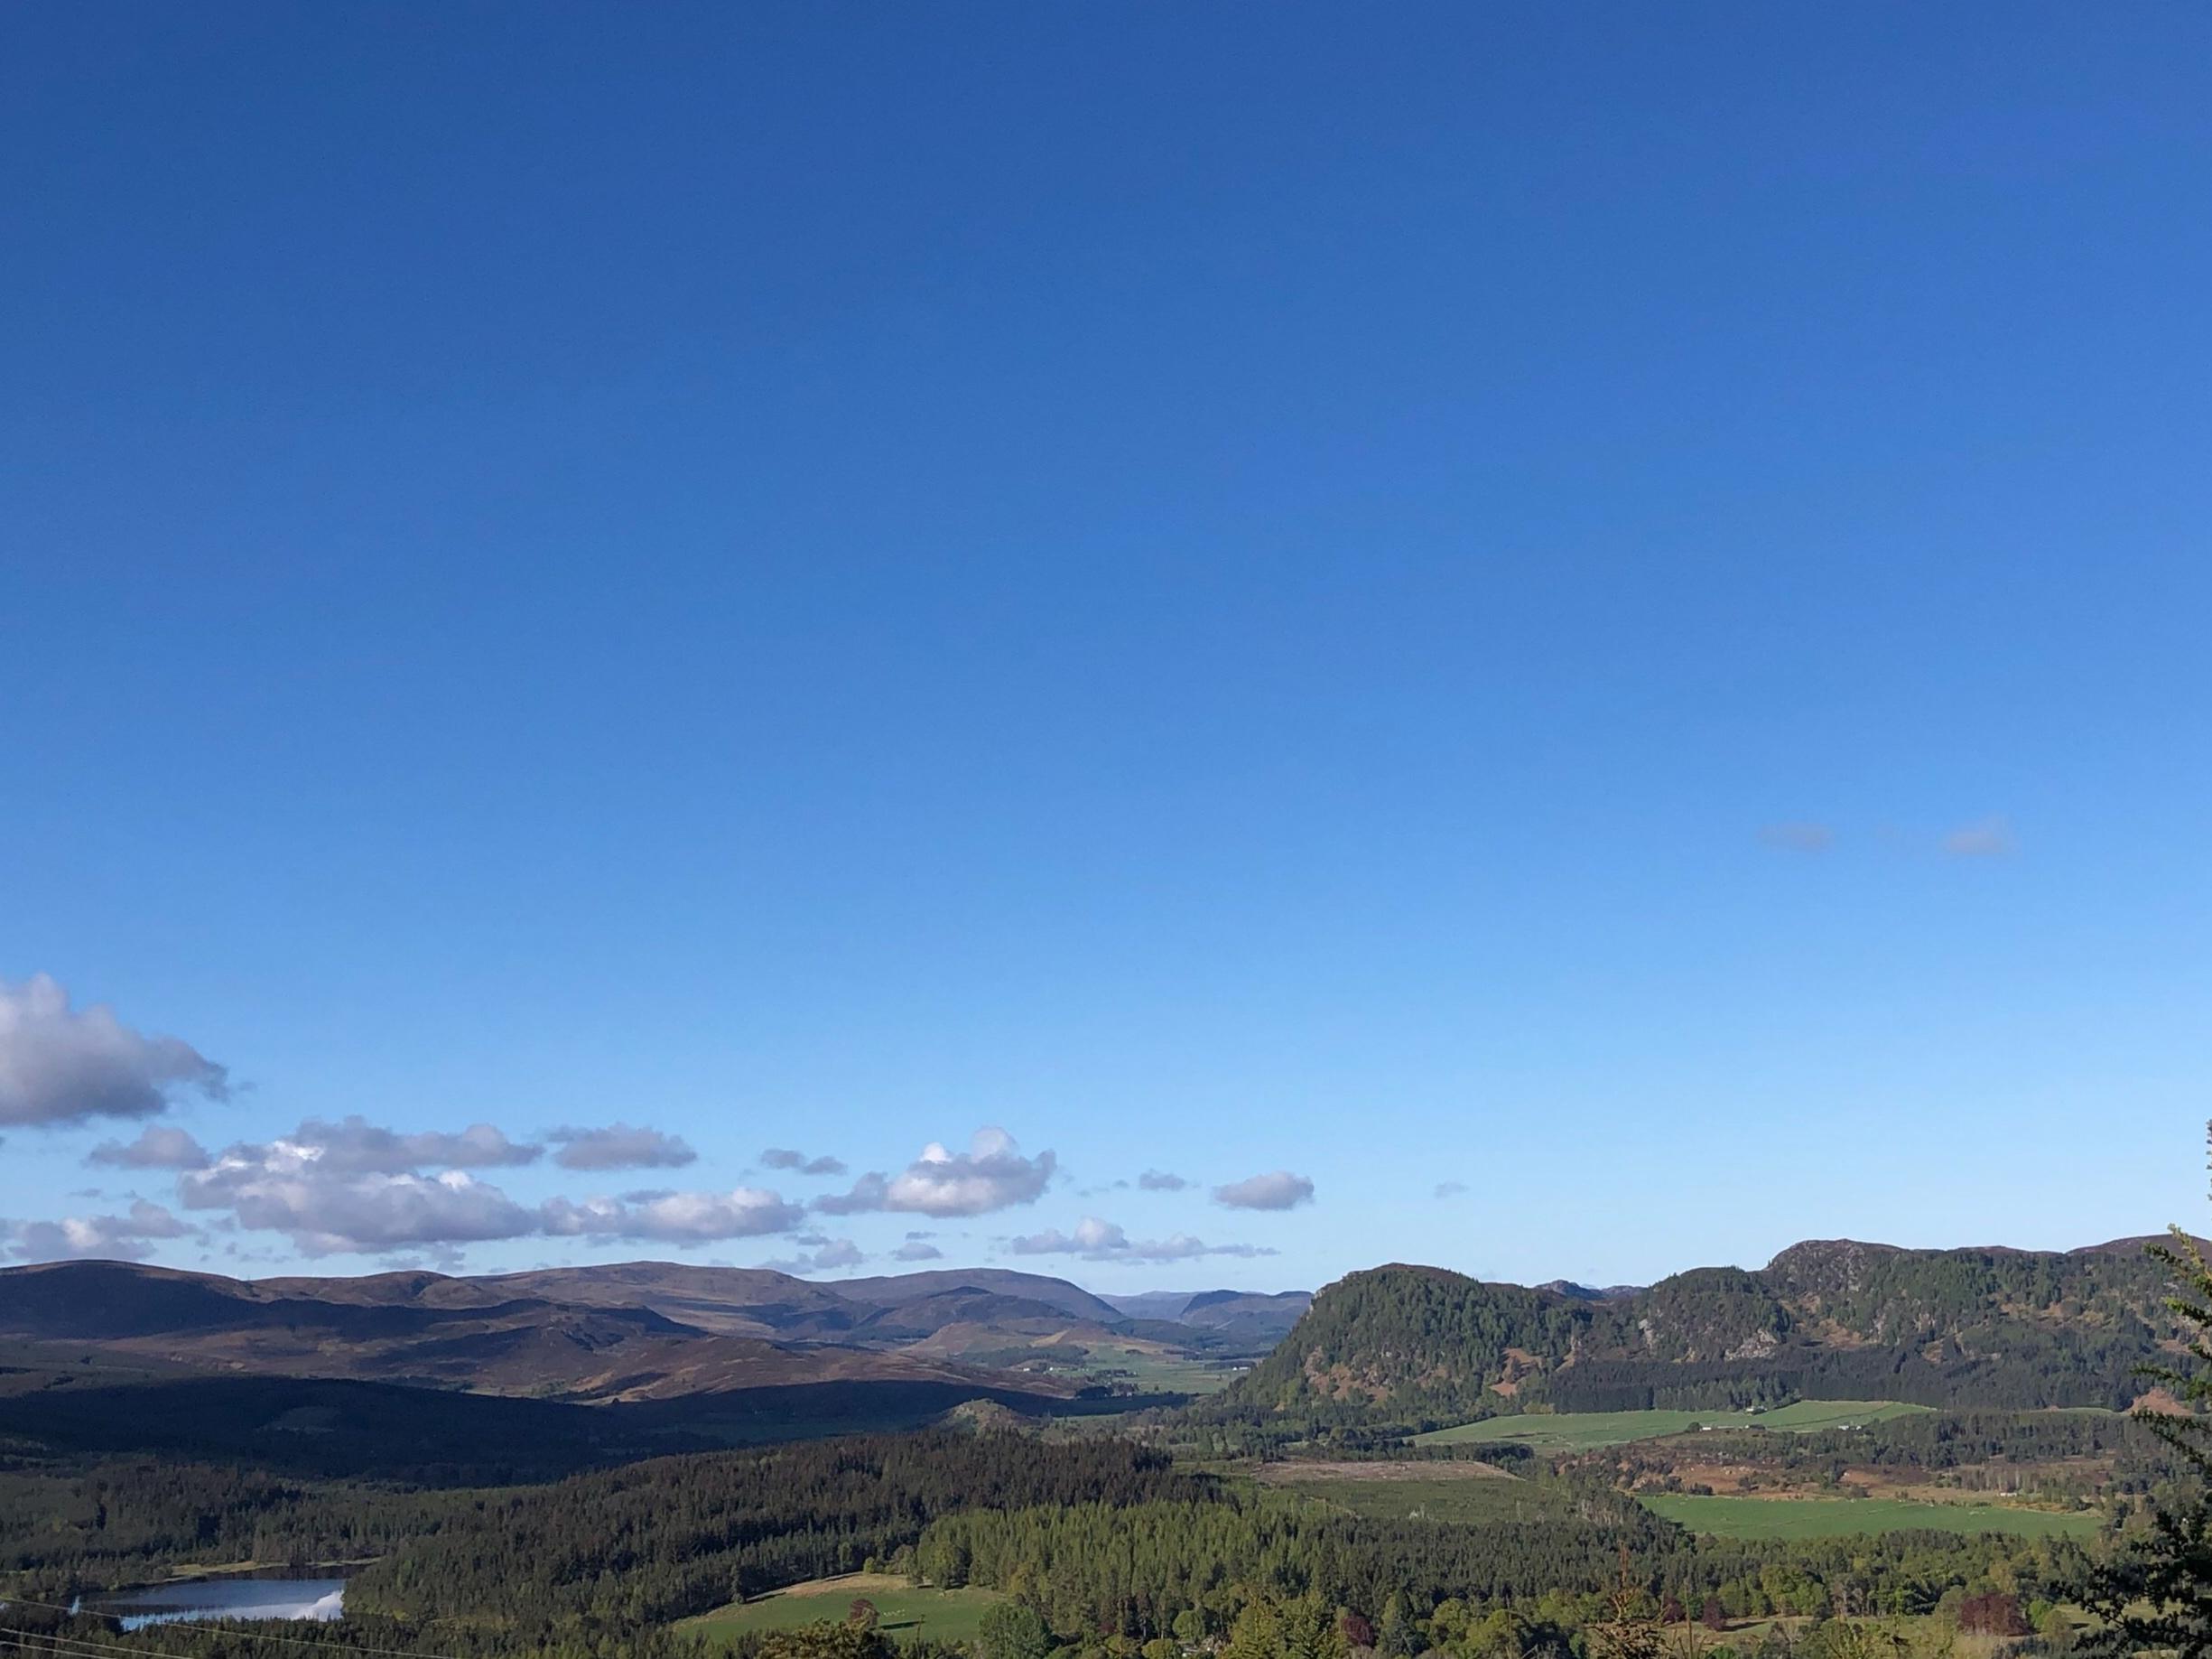 Loch Farr and Strathnairn